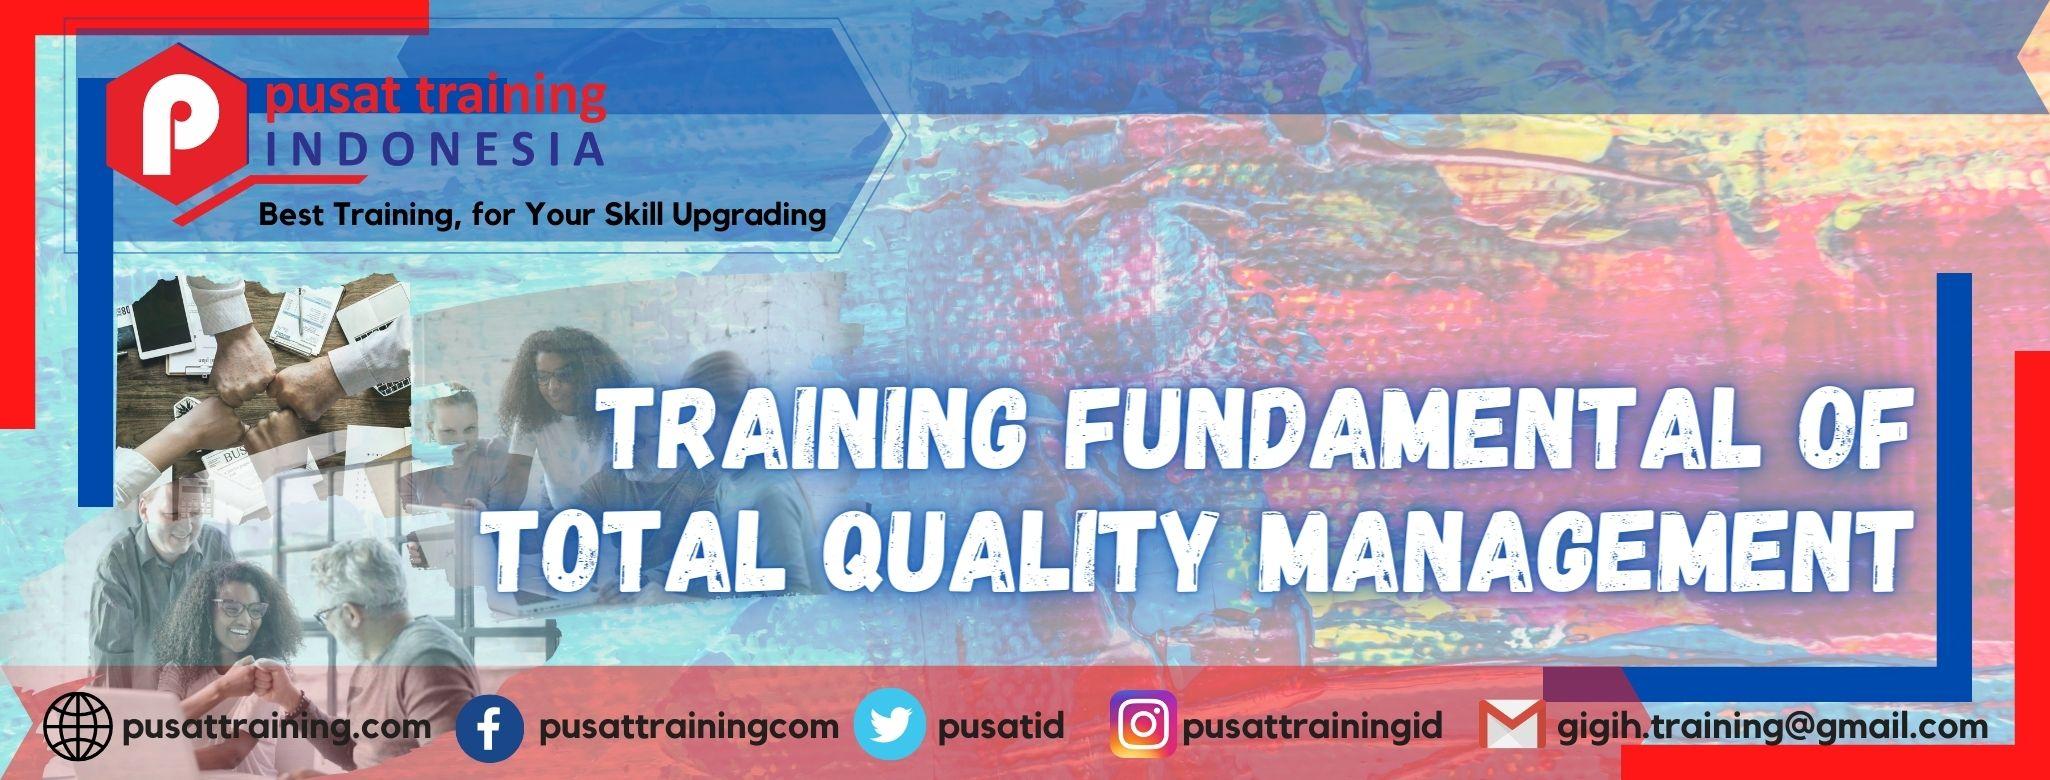 training-fundamental-of-total-quality-mangement